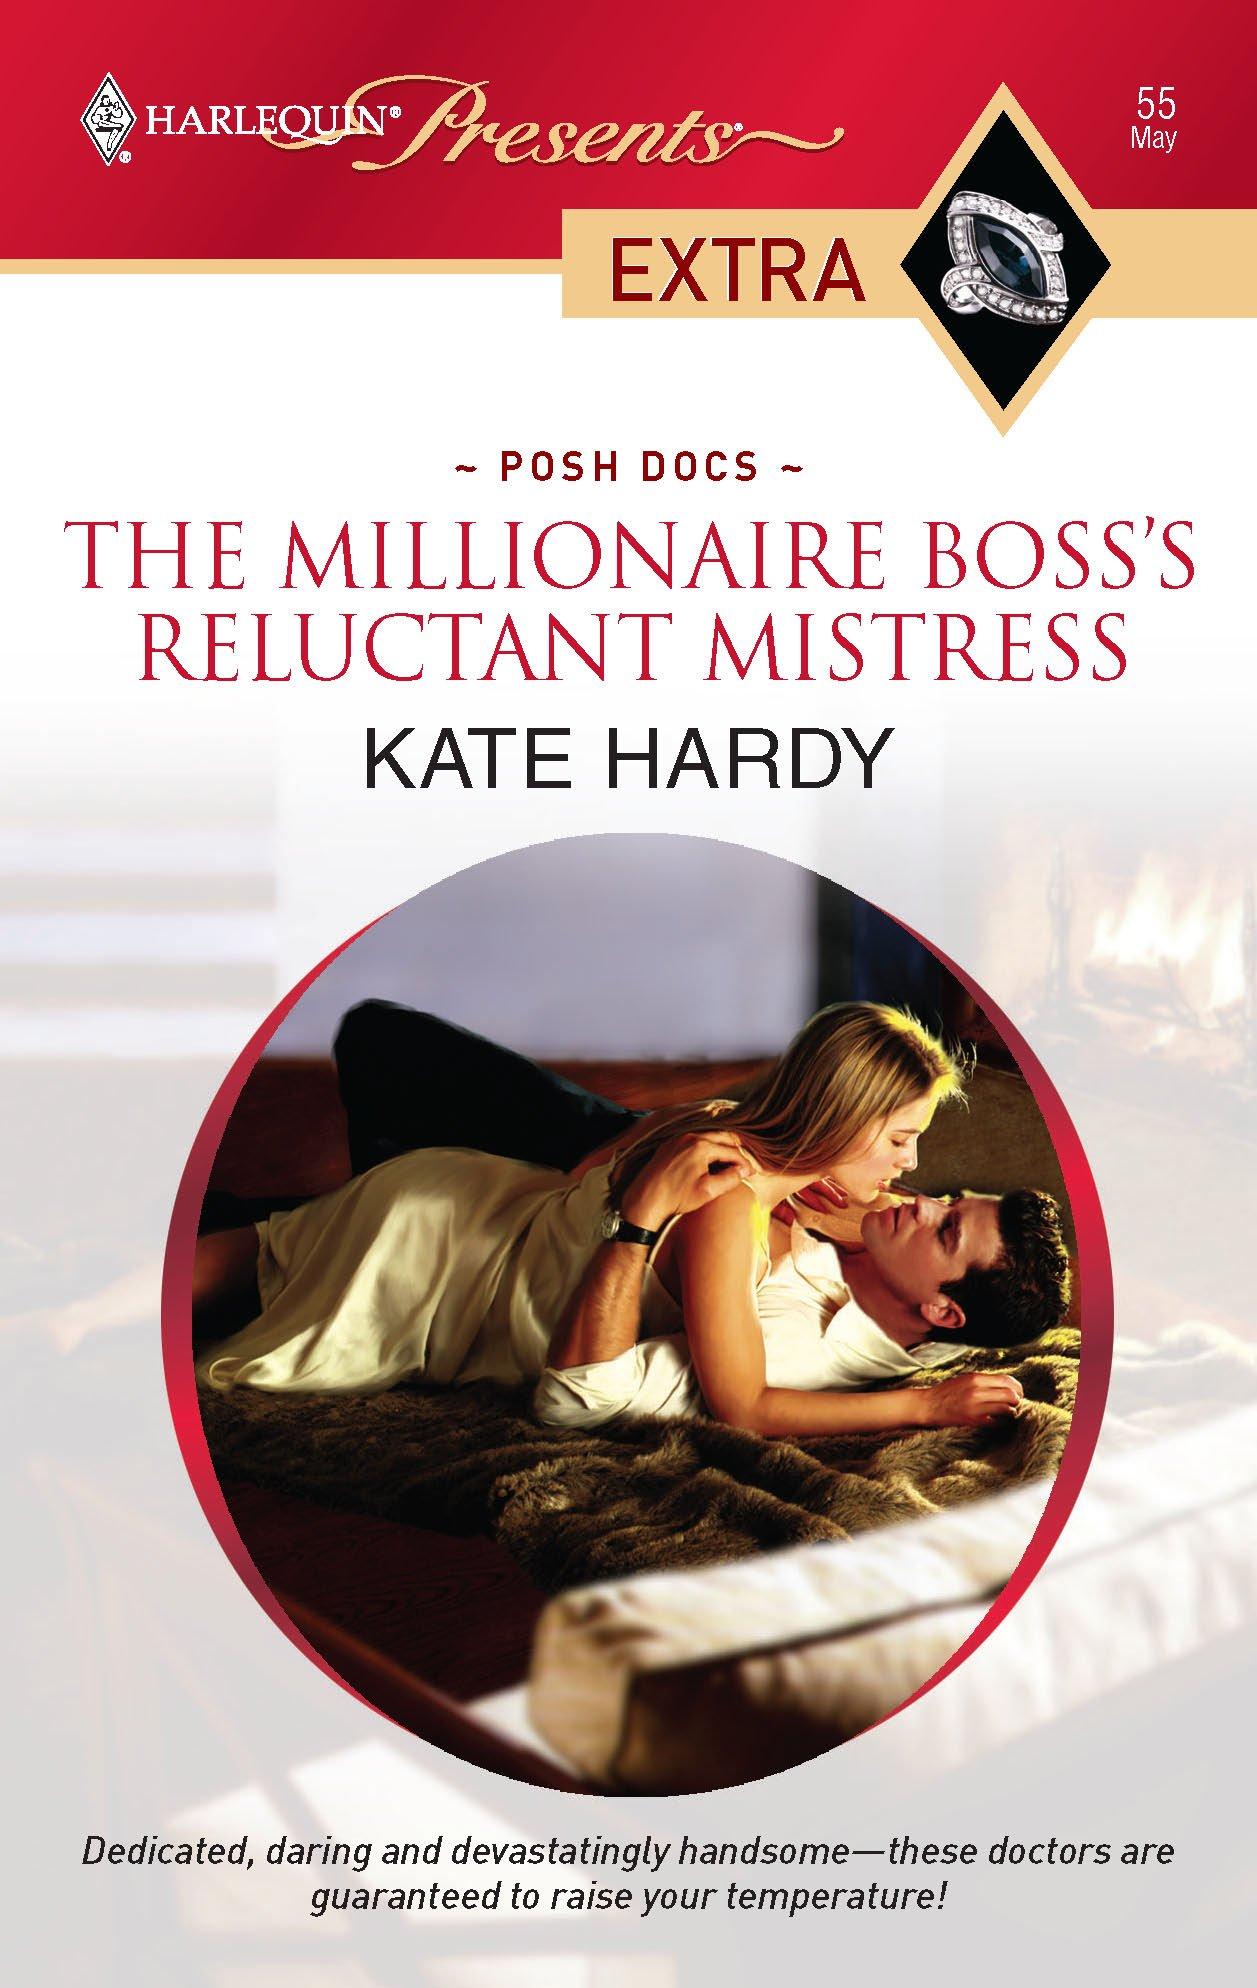 The Millionaire Boss's Reluctant Mistress ebook